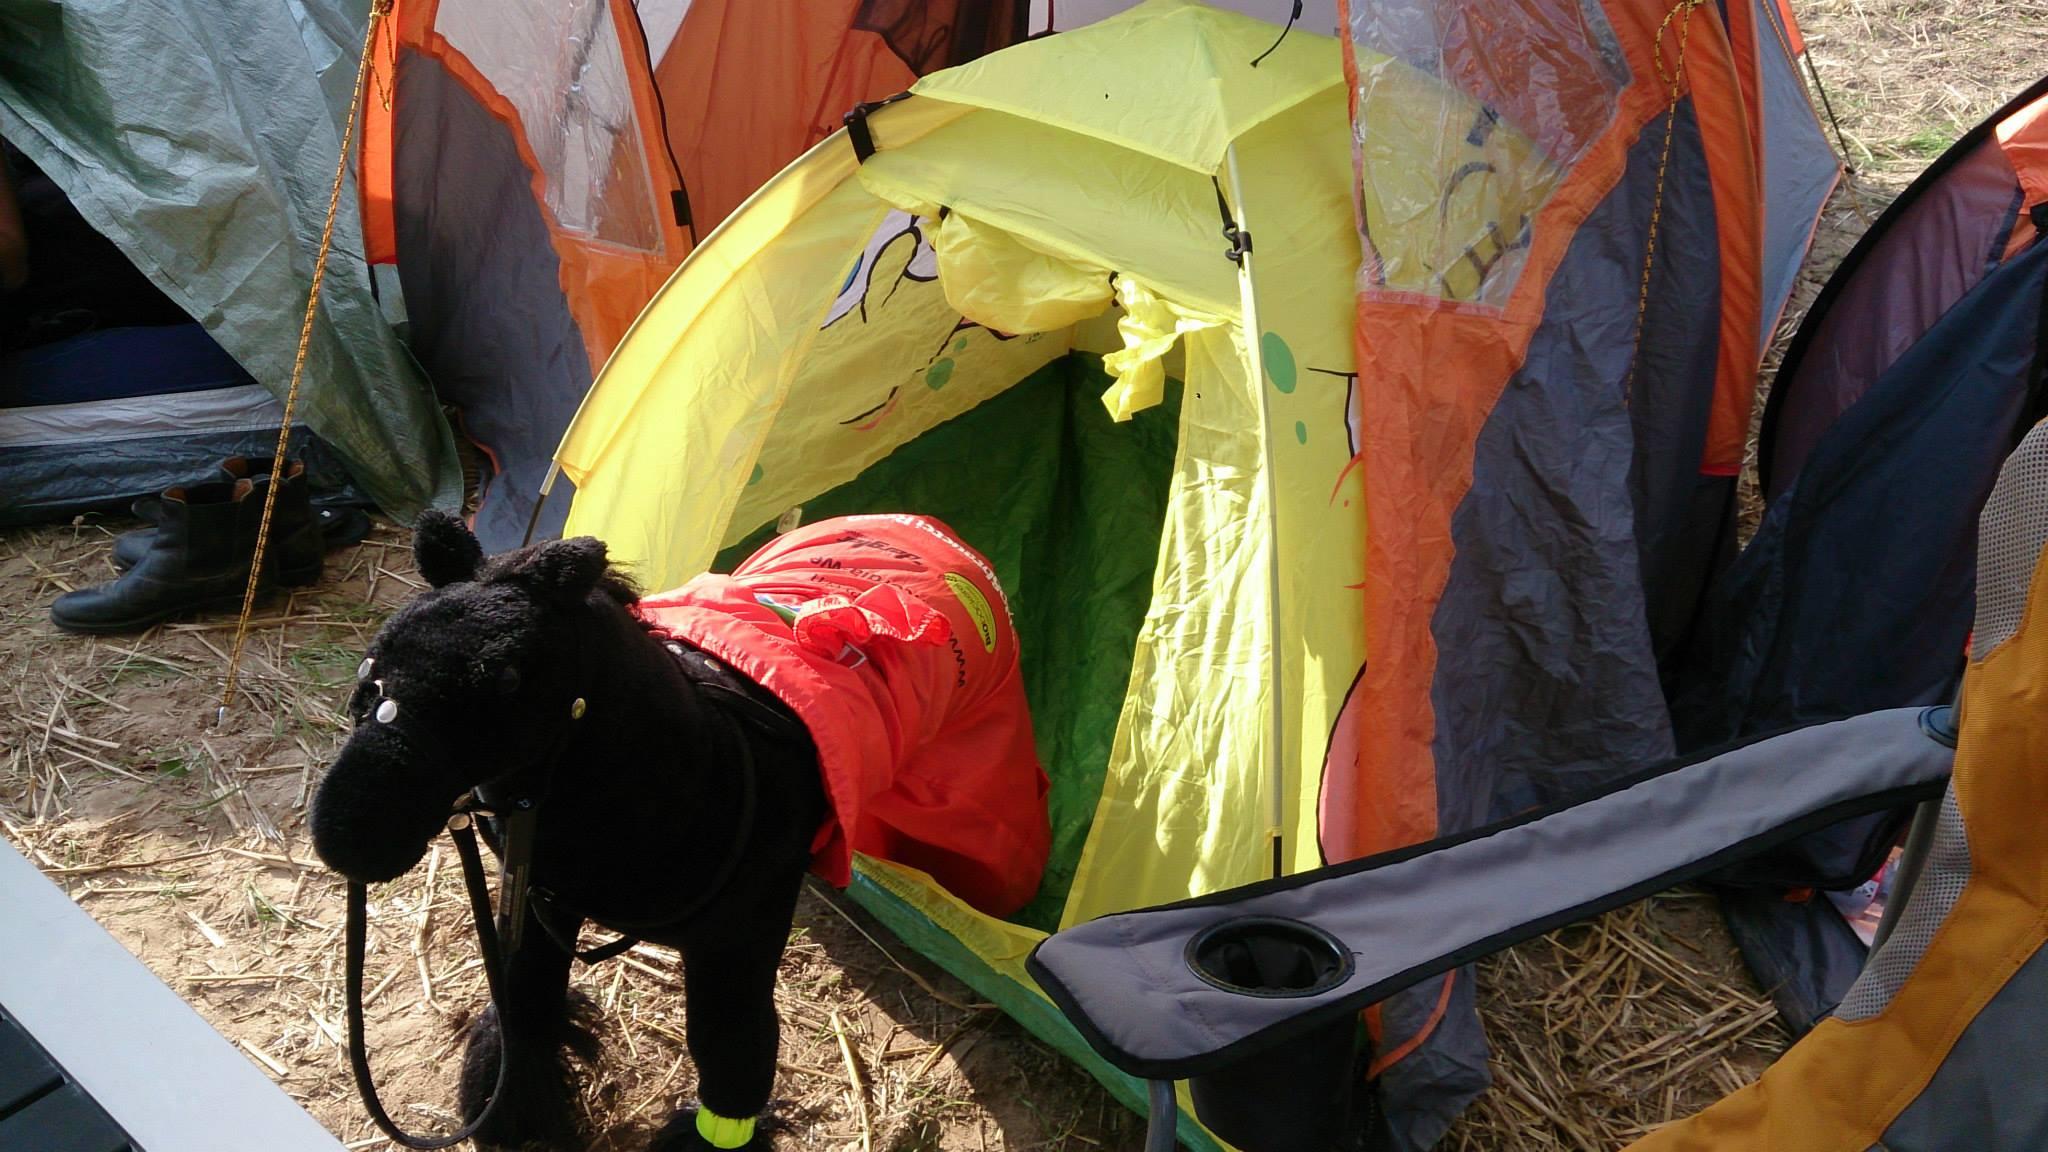 Henrietta in her tent